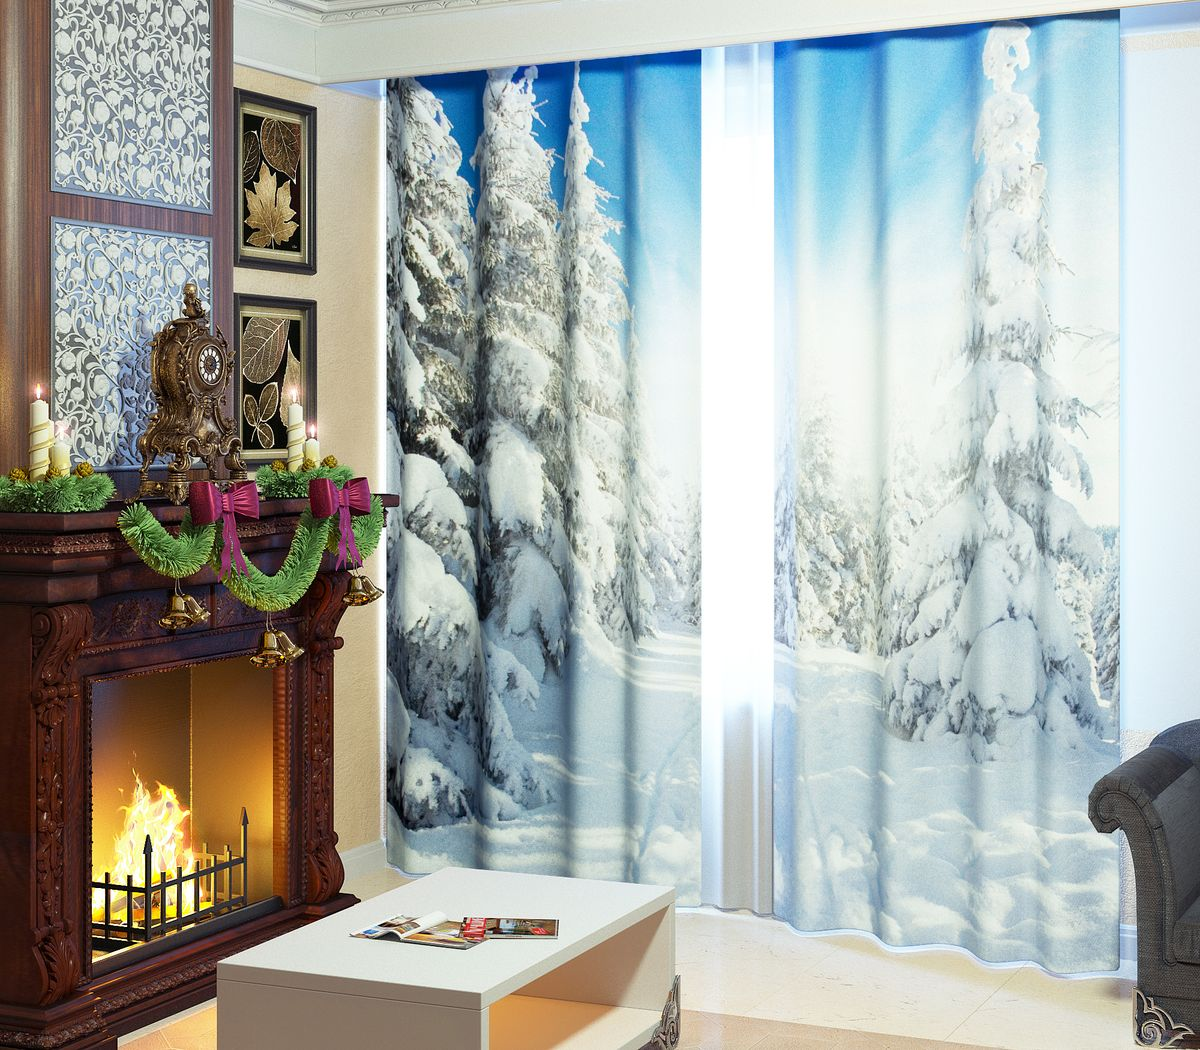 Комплект фотоштор Сирень Зимний лес, на ленте, высота 260 см комплект фотоштор сирень цветок любви на ленте высота 260 см